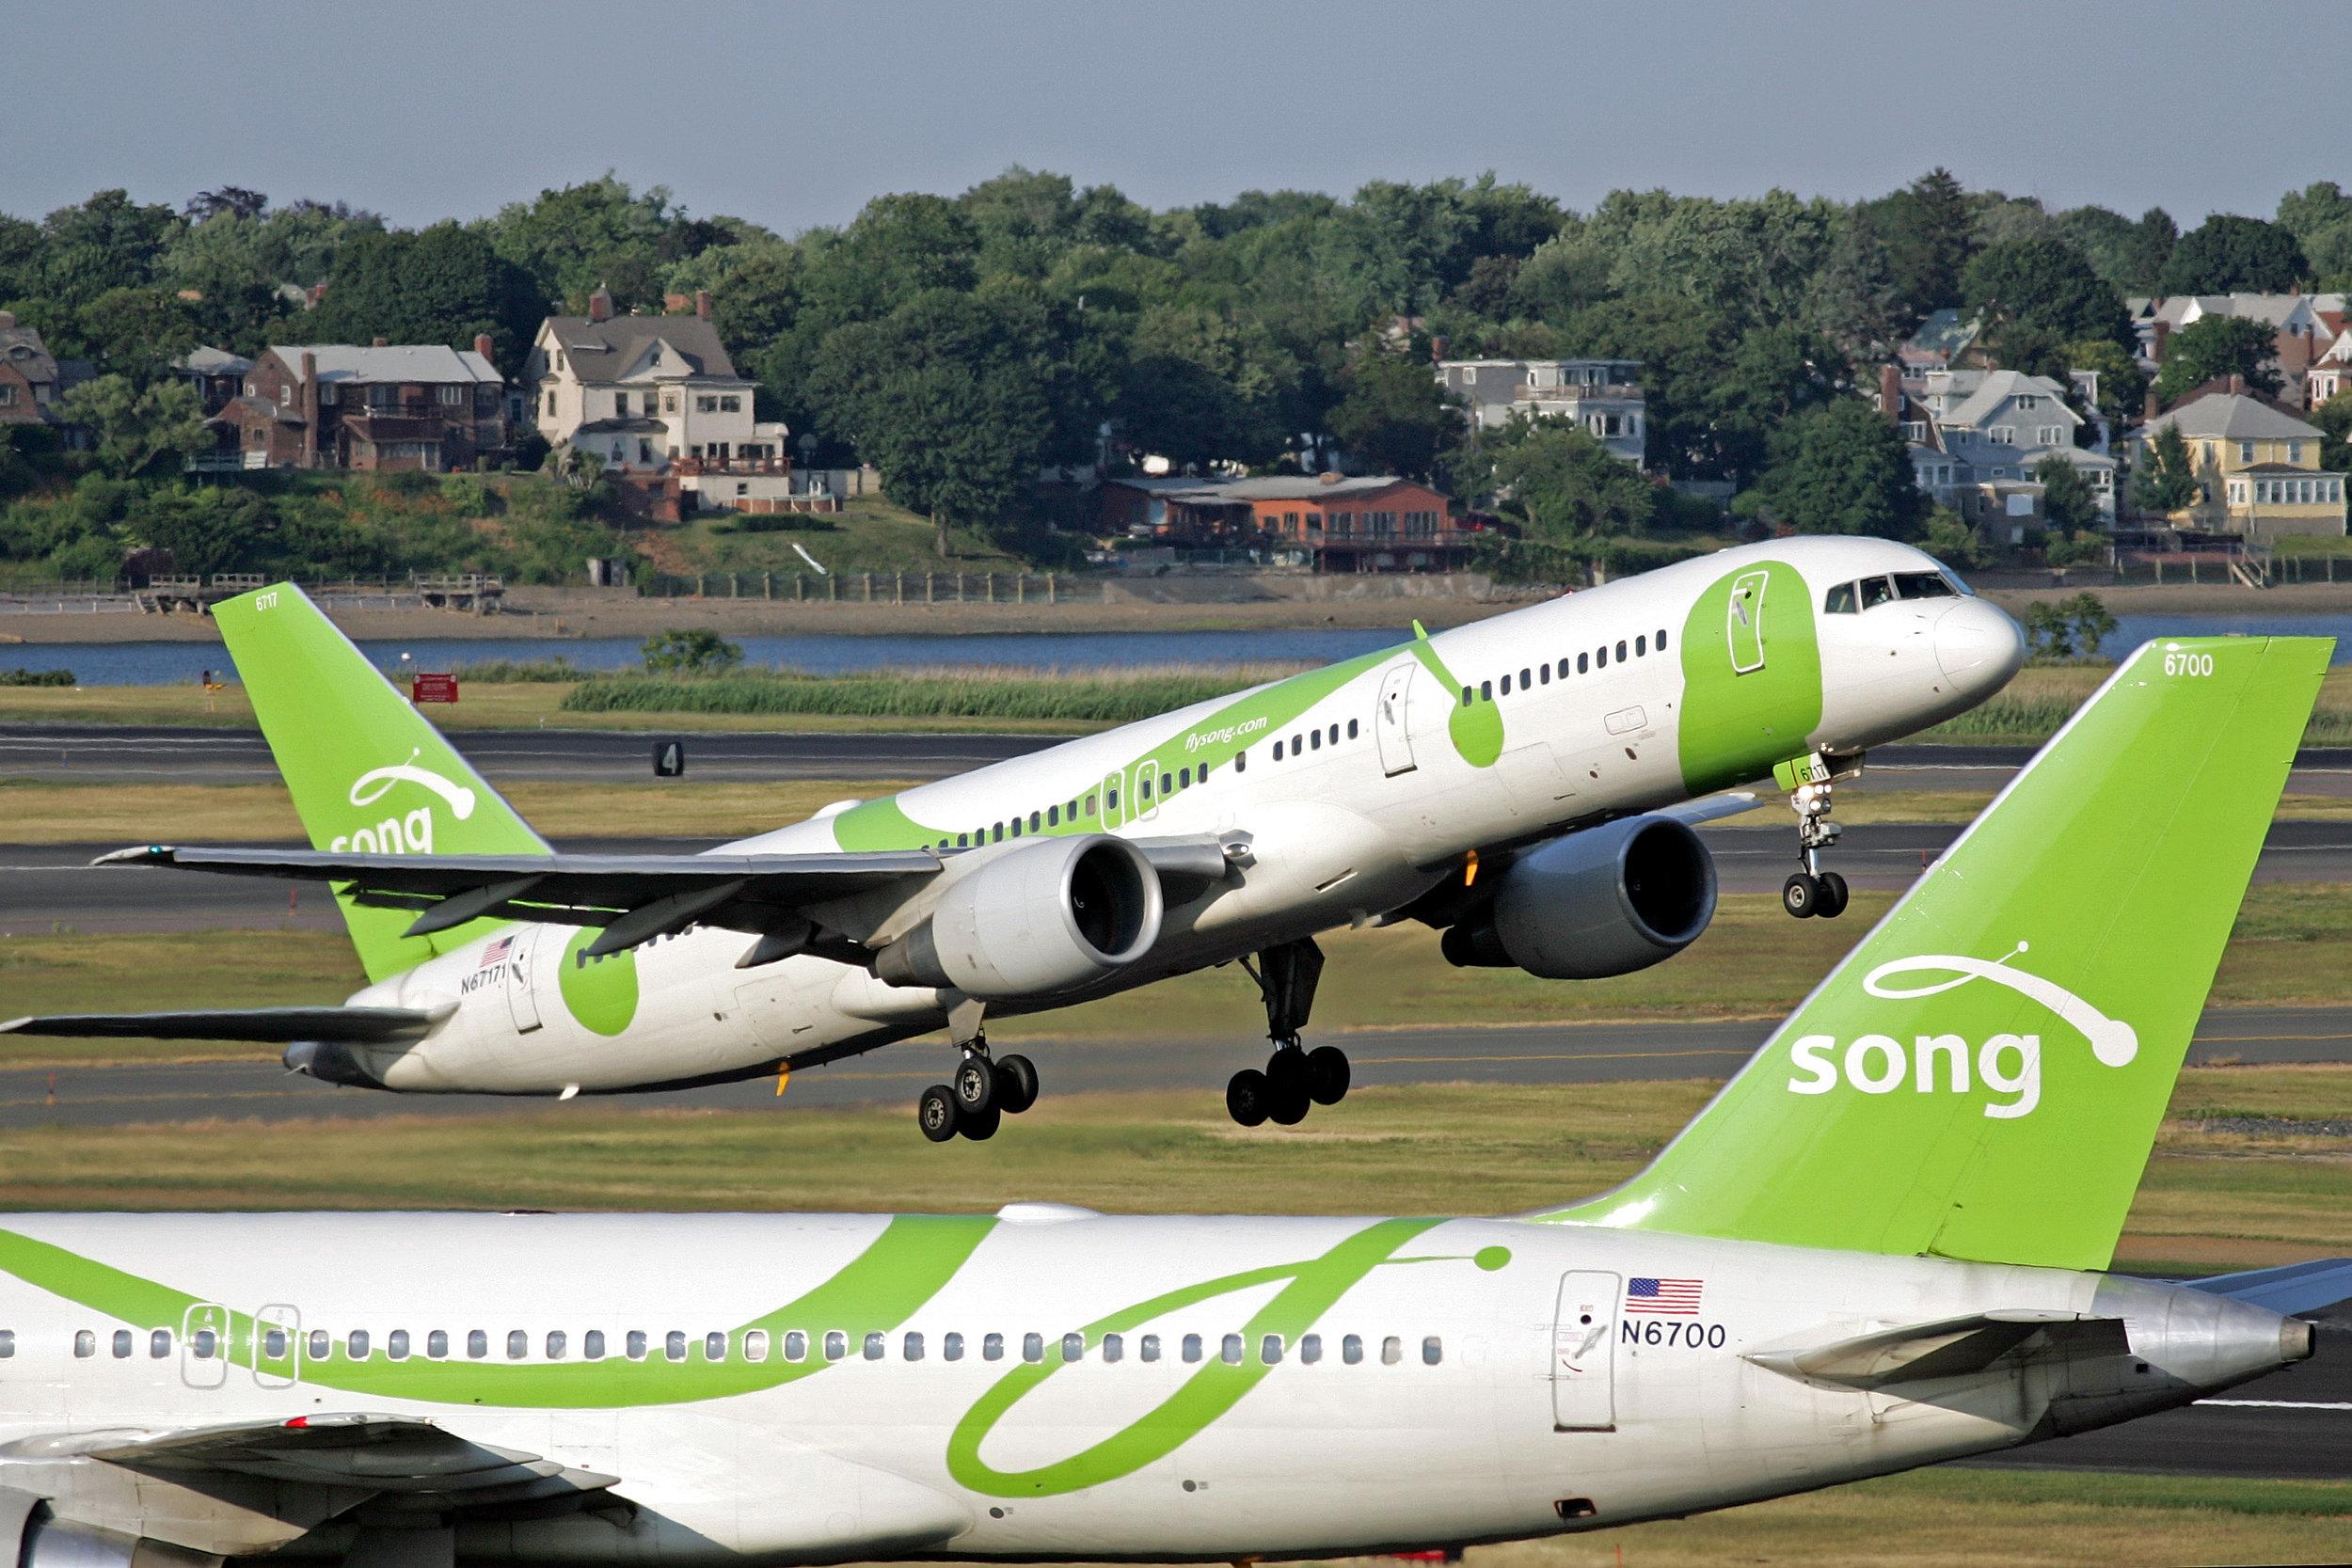 Airline_-Song-_Boeing_757.jpg